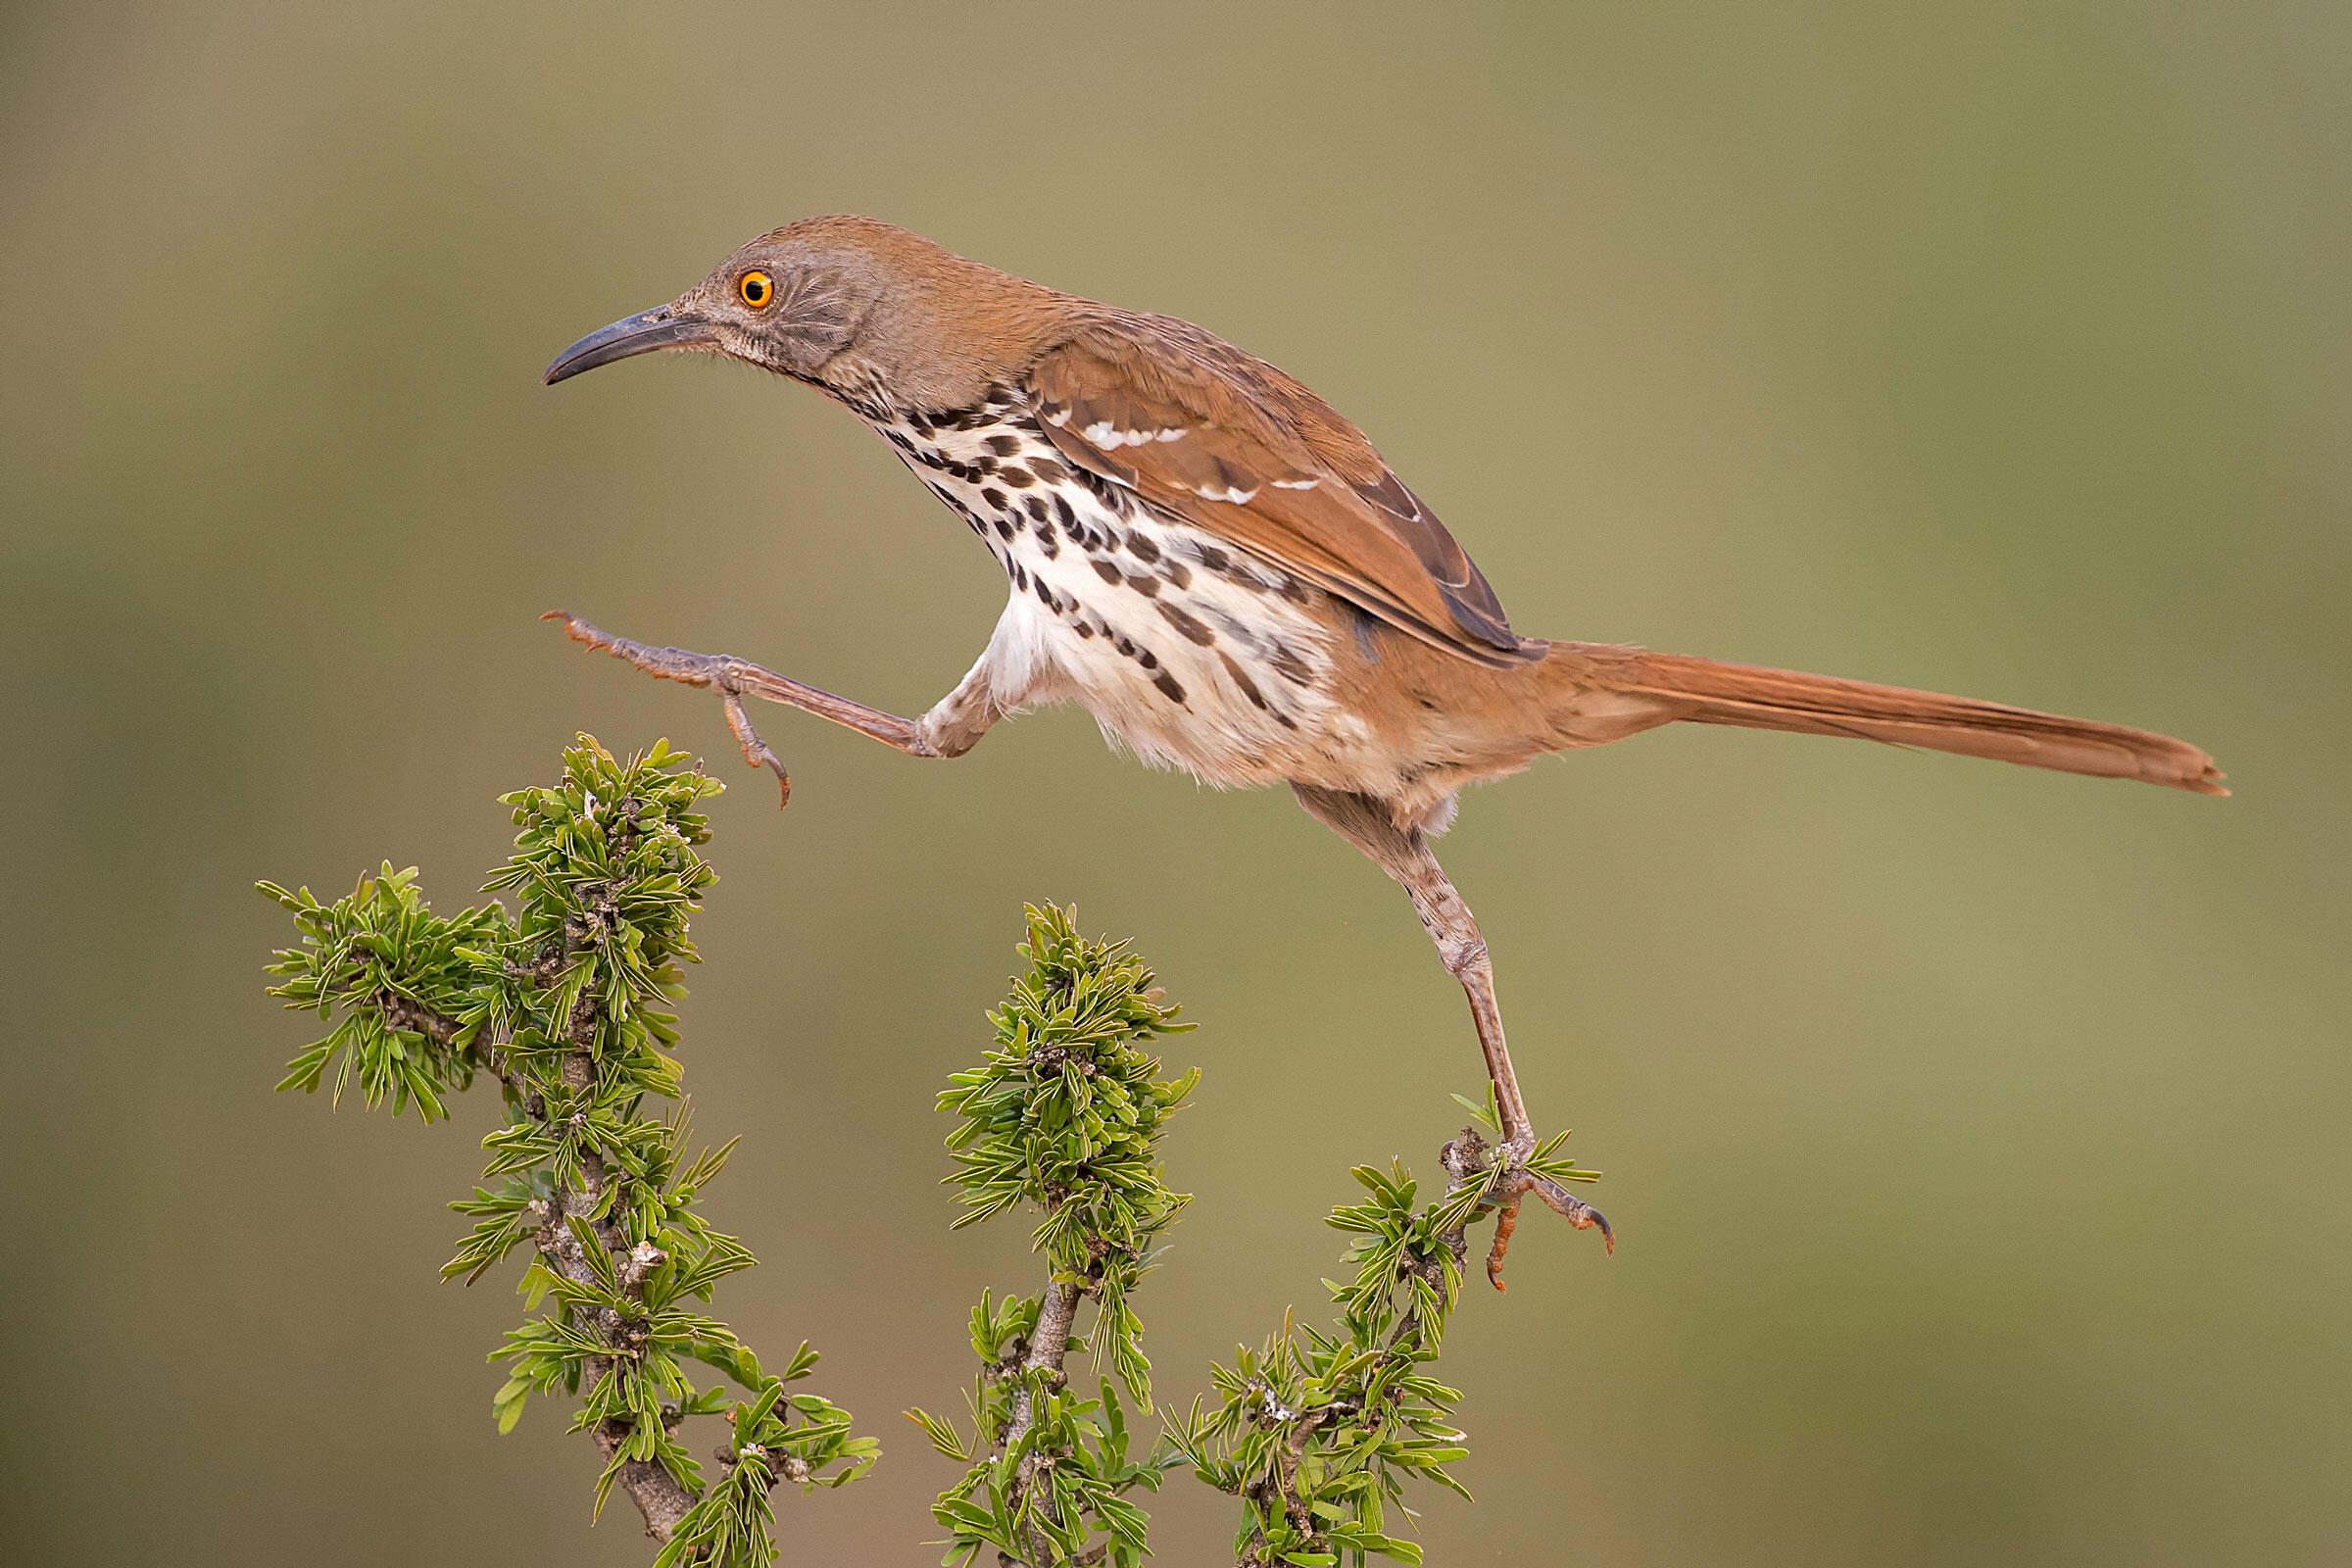 Long-billed Thrasher/Professional Category. Hector Astorga/Audubon Photography Awards